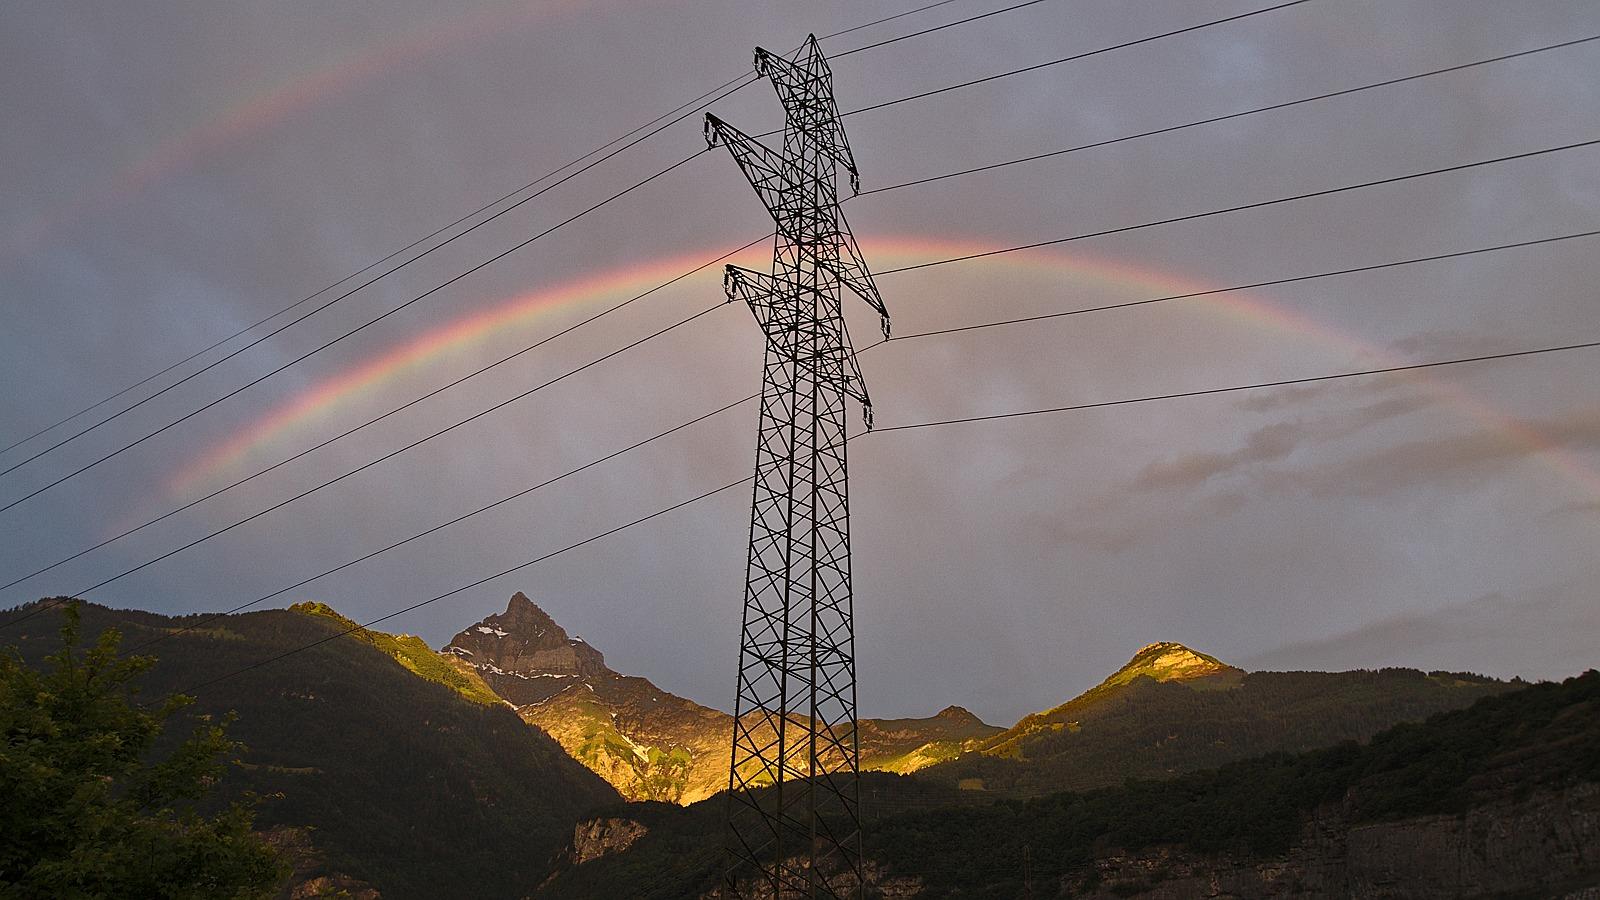 180705_0334 - Dents Du Midi - Rainbow